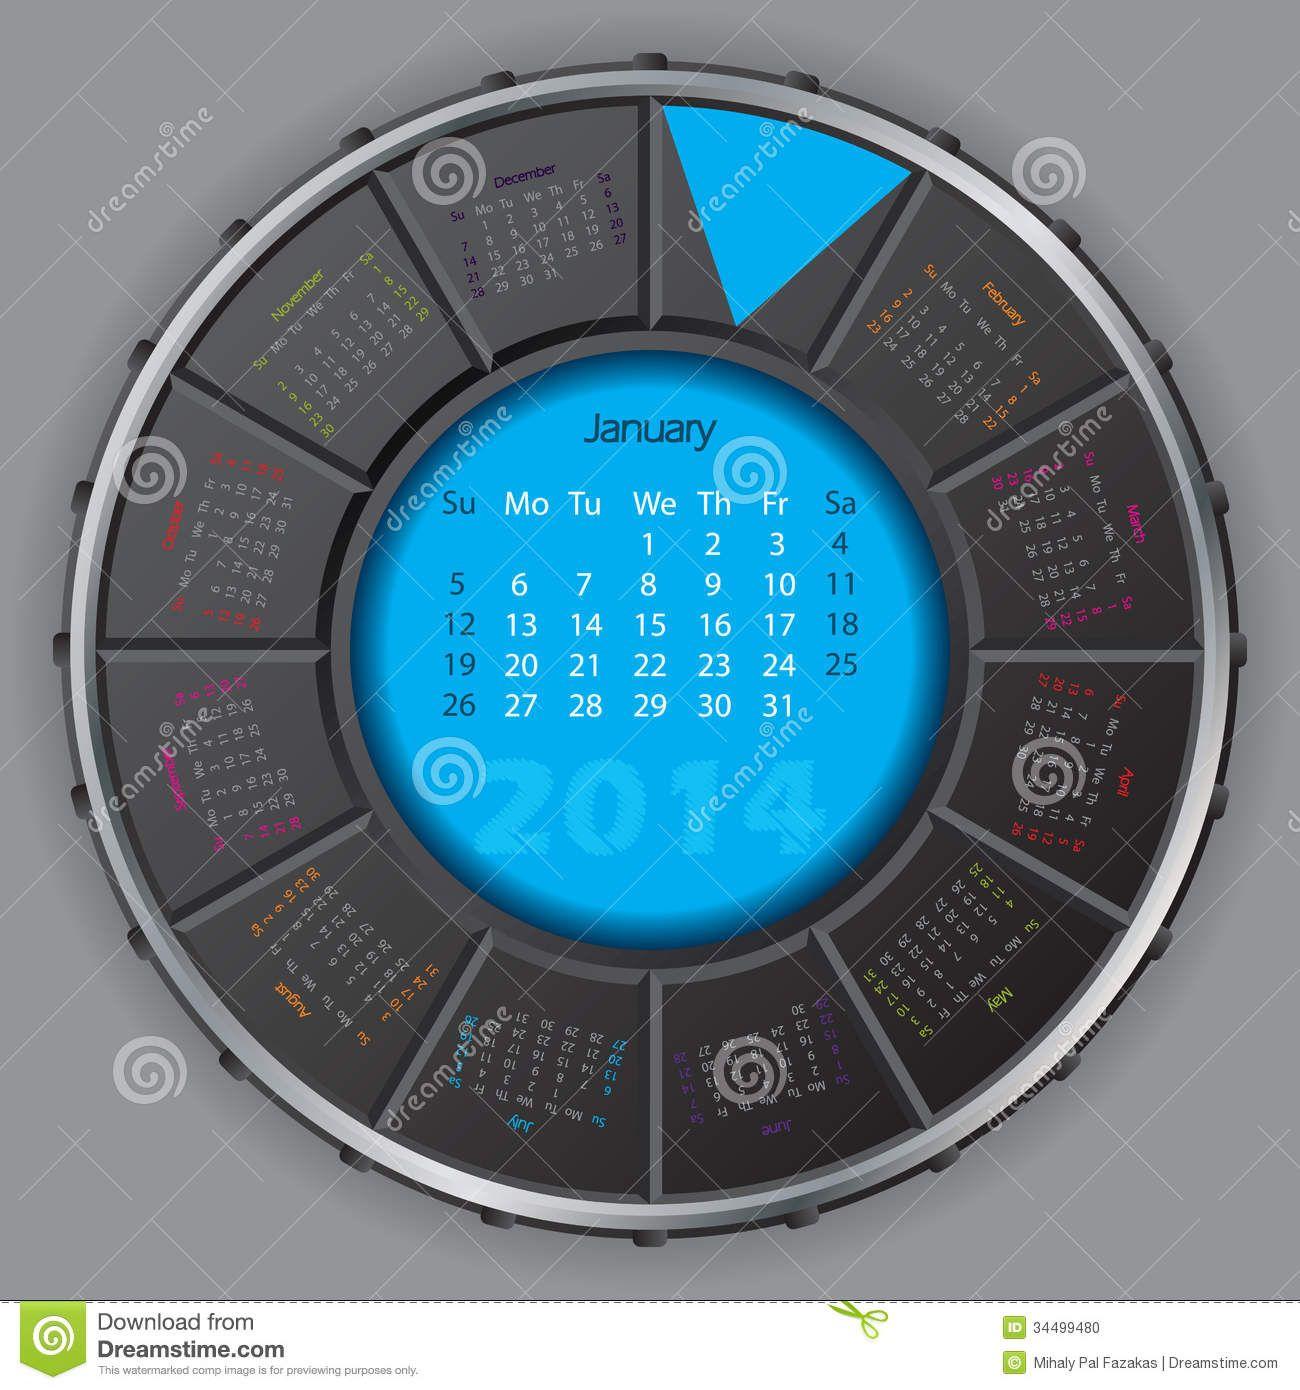 Creative Digital Calendar unusual and creative calendar designs - google search | creatives